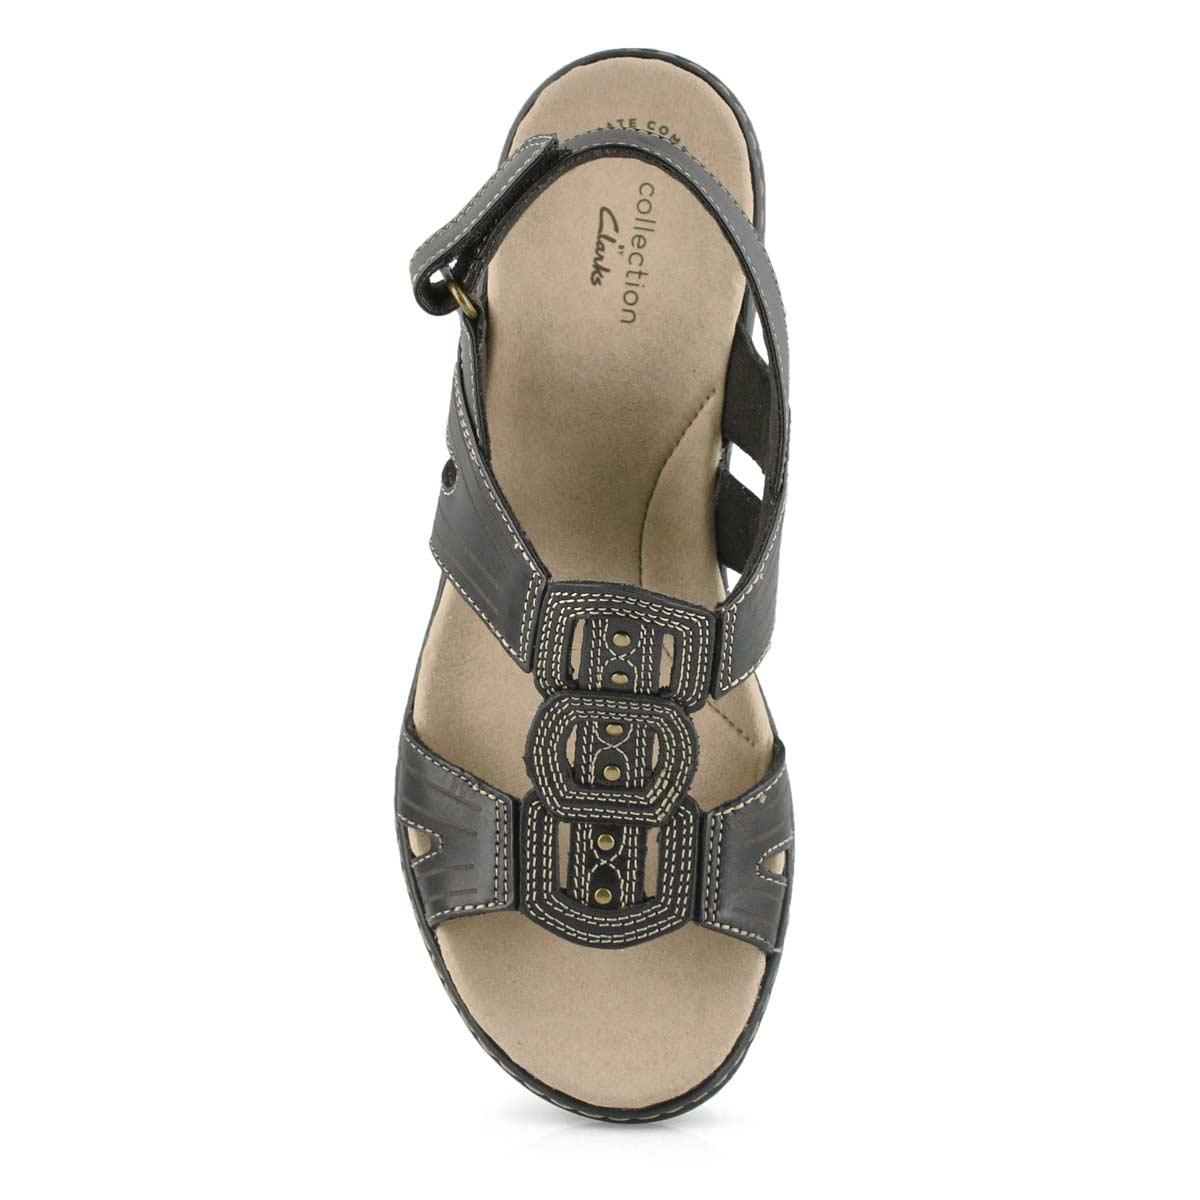 Lds Leisa Vine black casual sandal